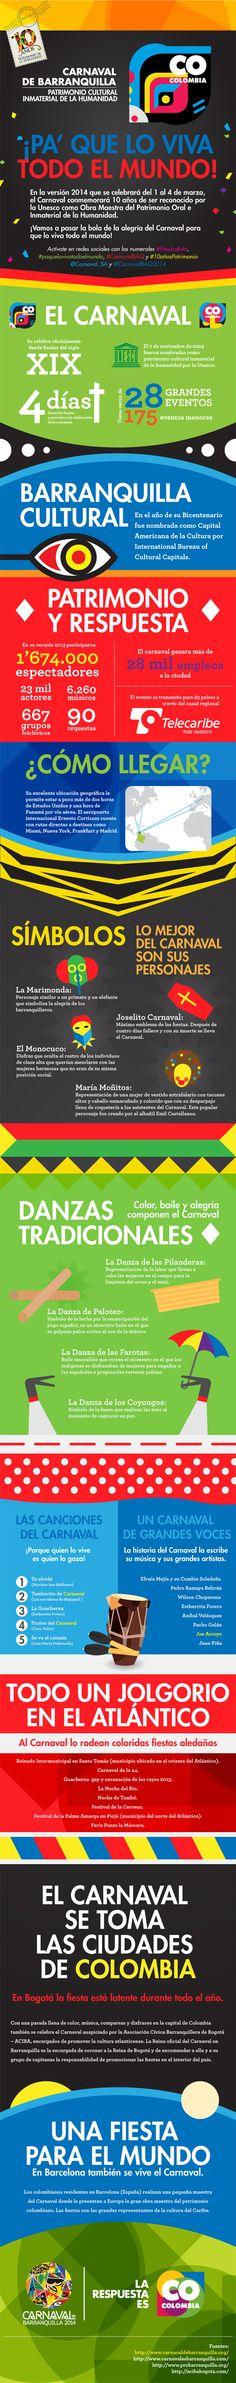 infografia-carnaval